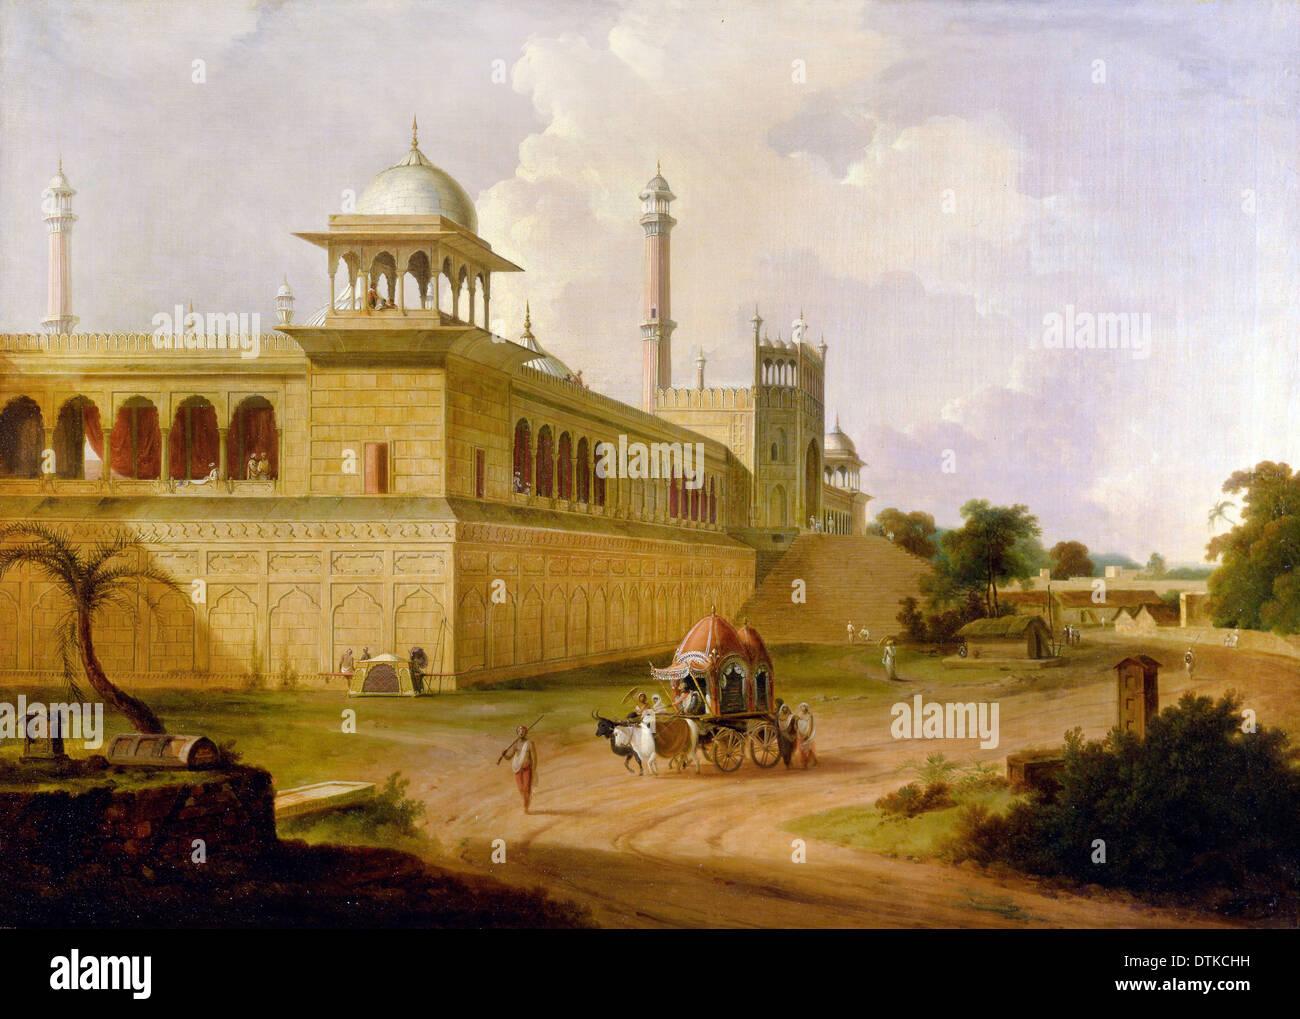 Arthur Devis, Jami Masjid, Delhi 1811 Oil on canvas. Yale Center for British Art, New Haven, USA. - Stock Image